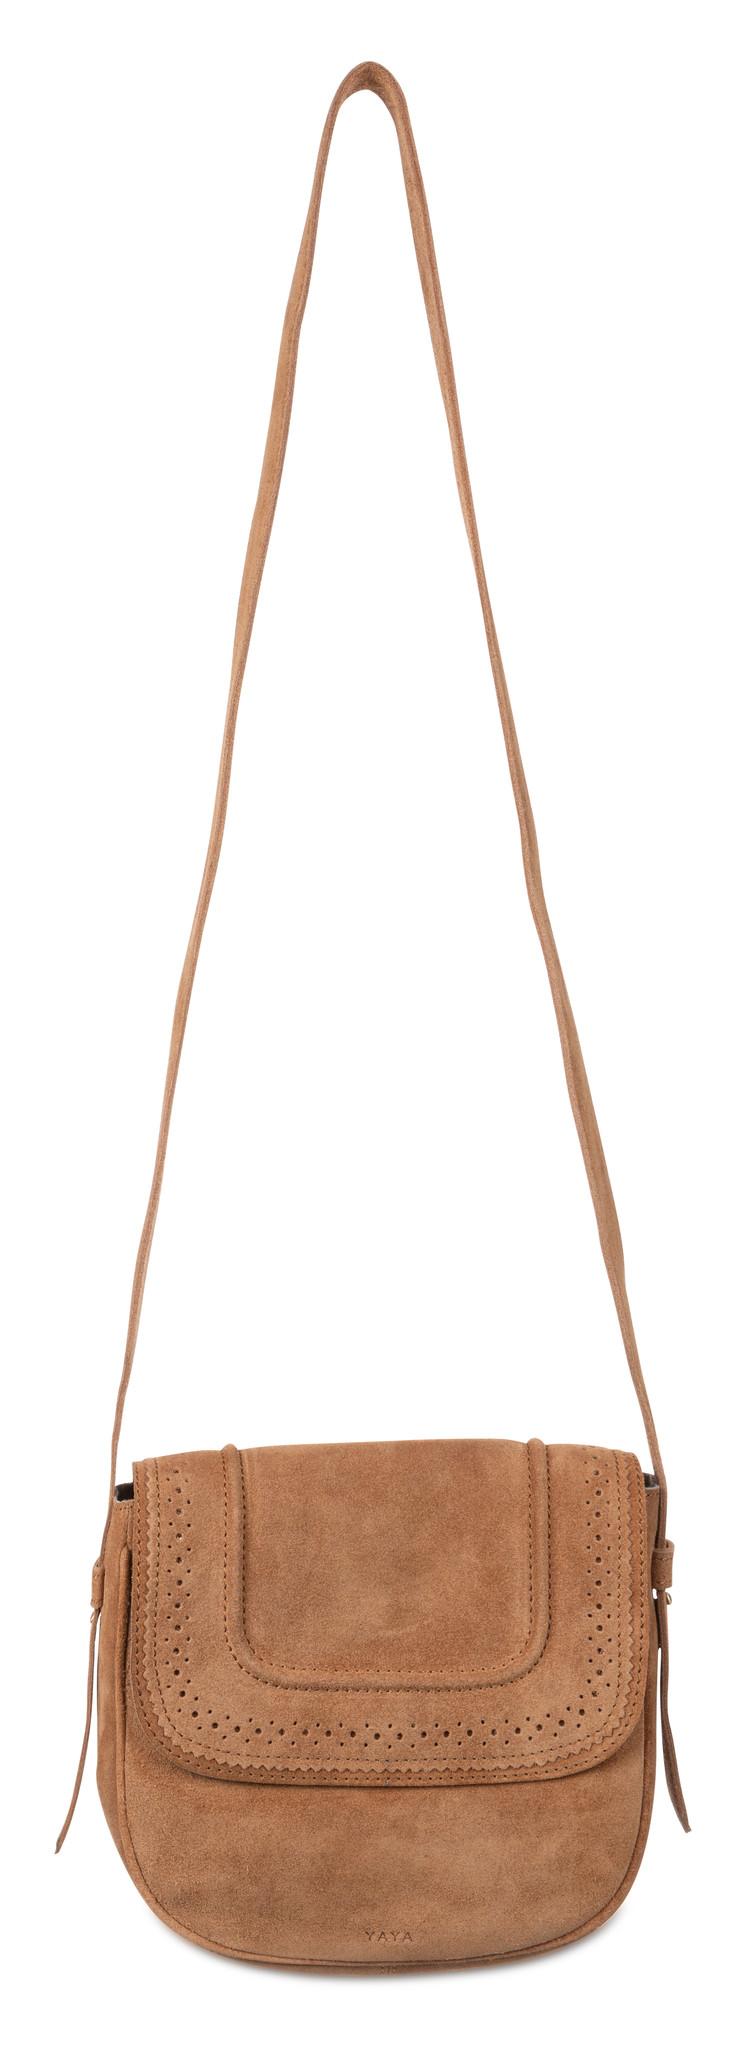 yaya Suede strap bag 131359-014-2